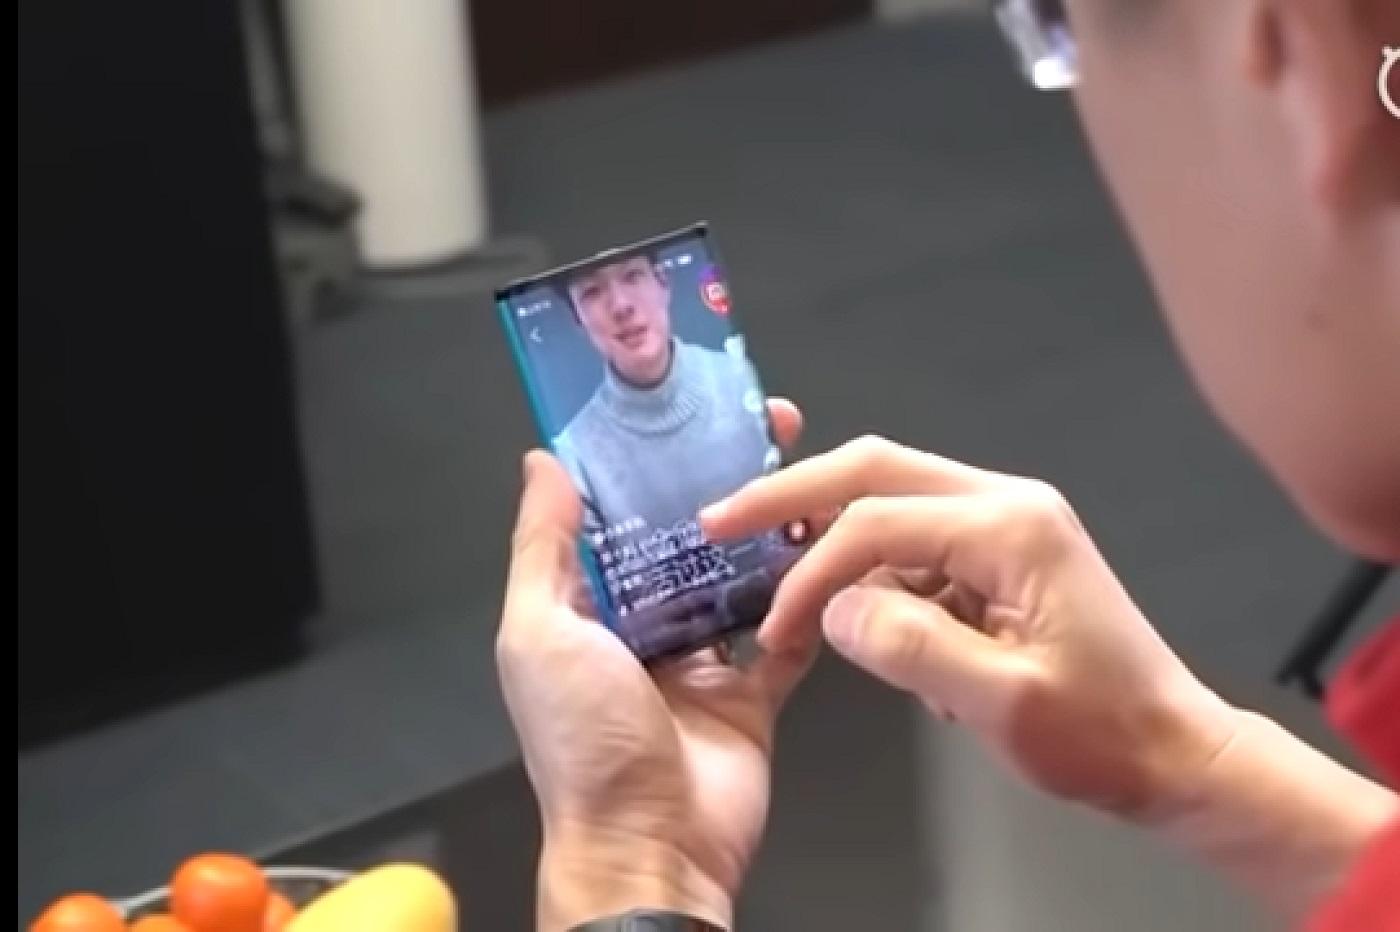 Le smartphone pliable de Xiaomi